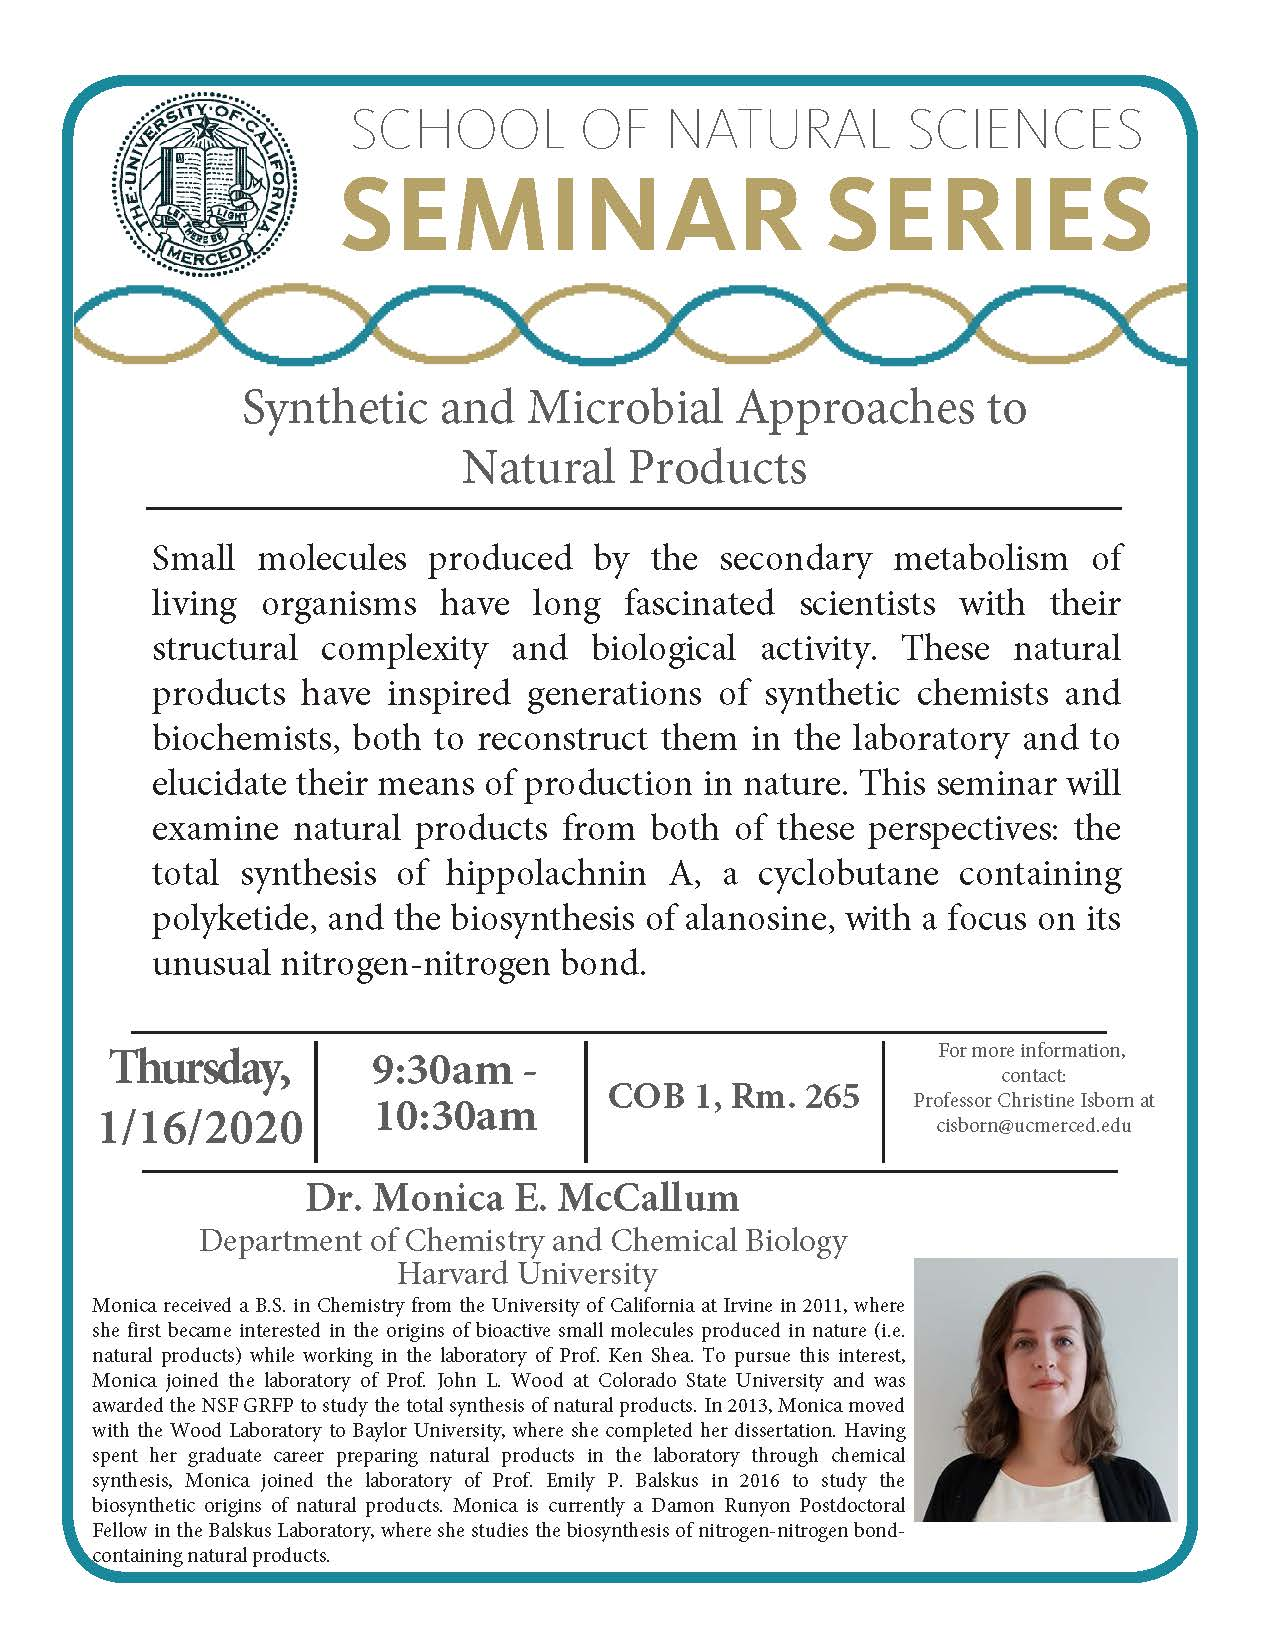 UC Merced School of Natural Sciences Seminar Series